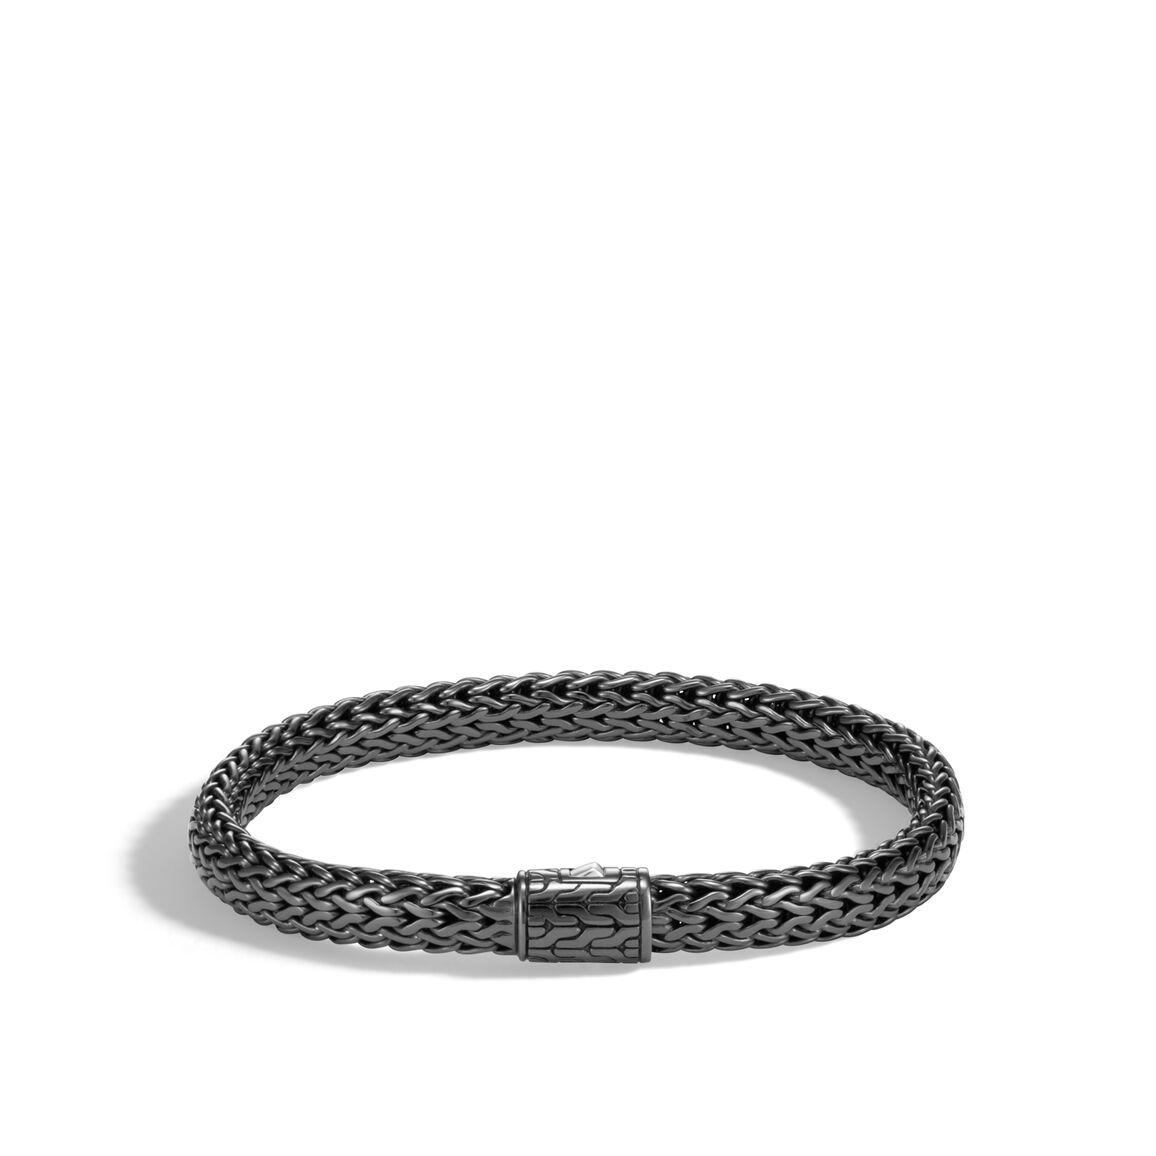 Classic Chain 6.5MM Bracelet in Blackened Silver